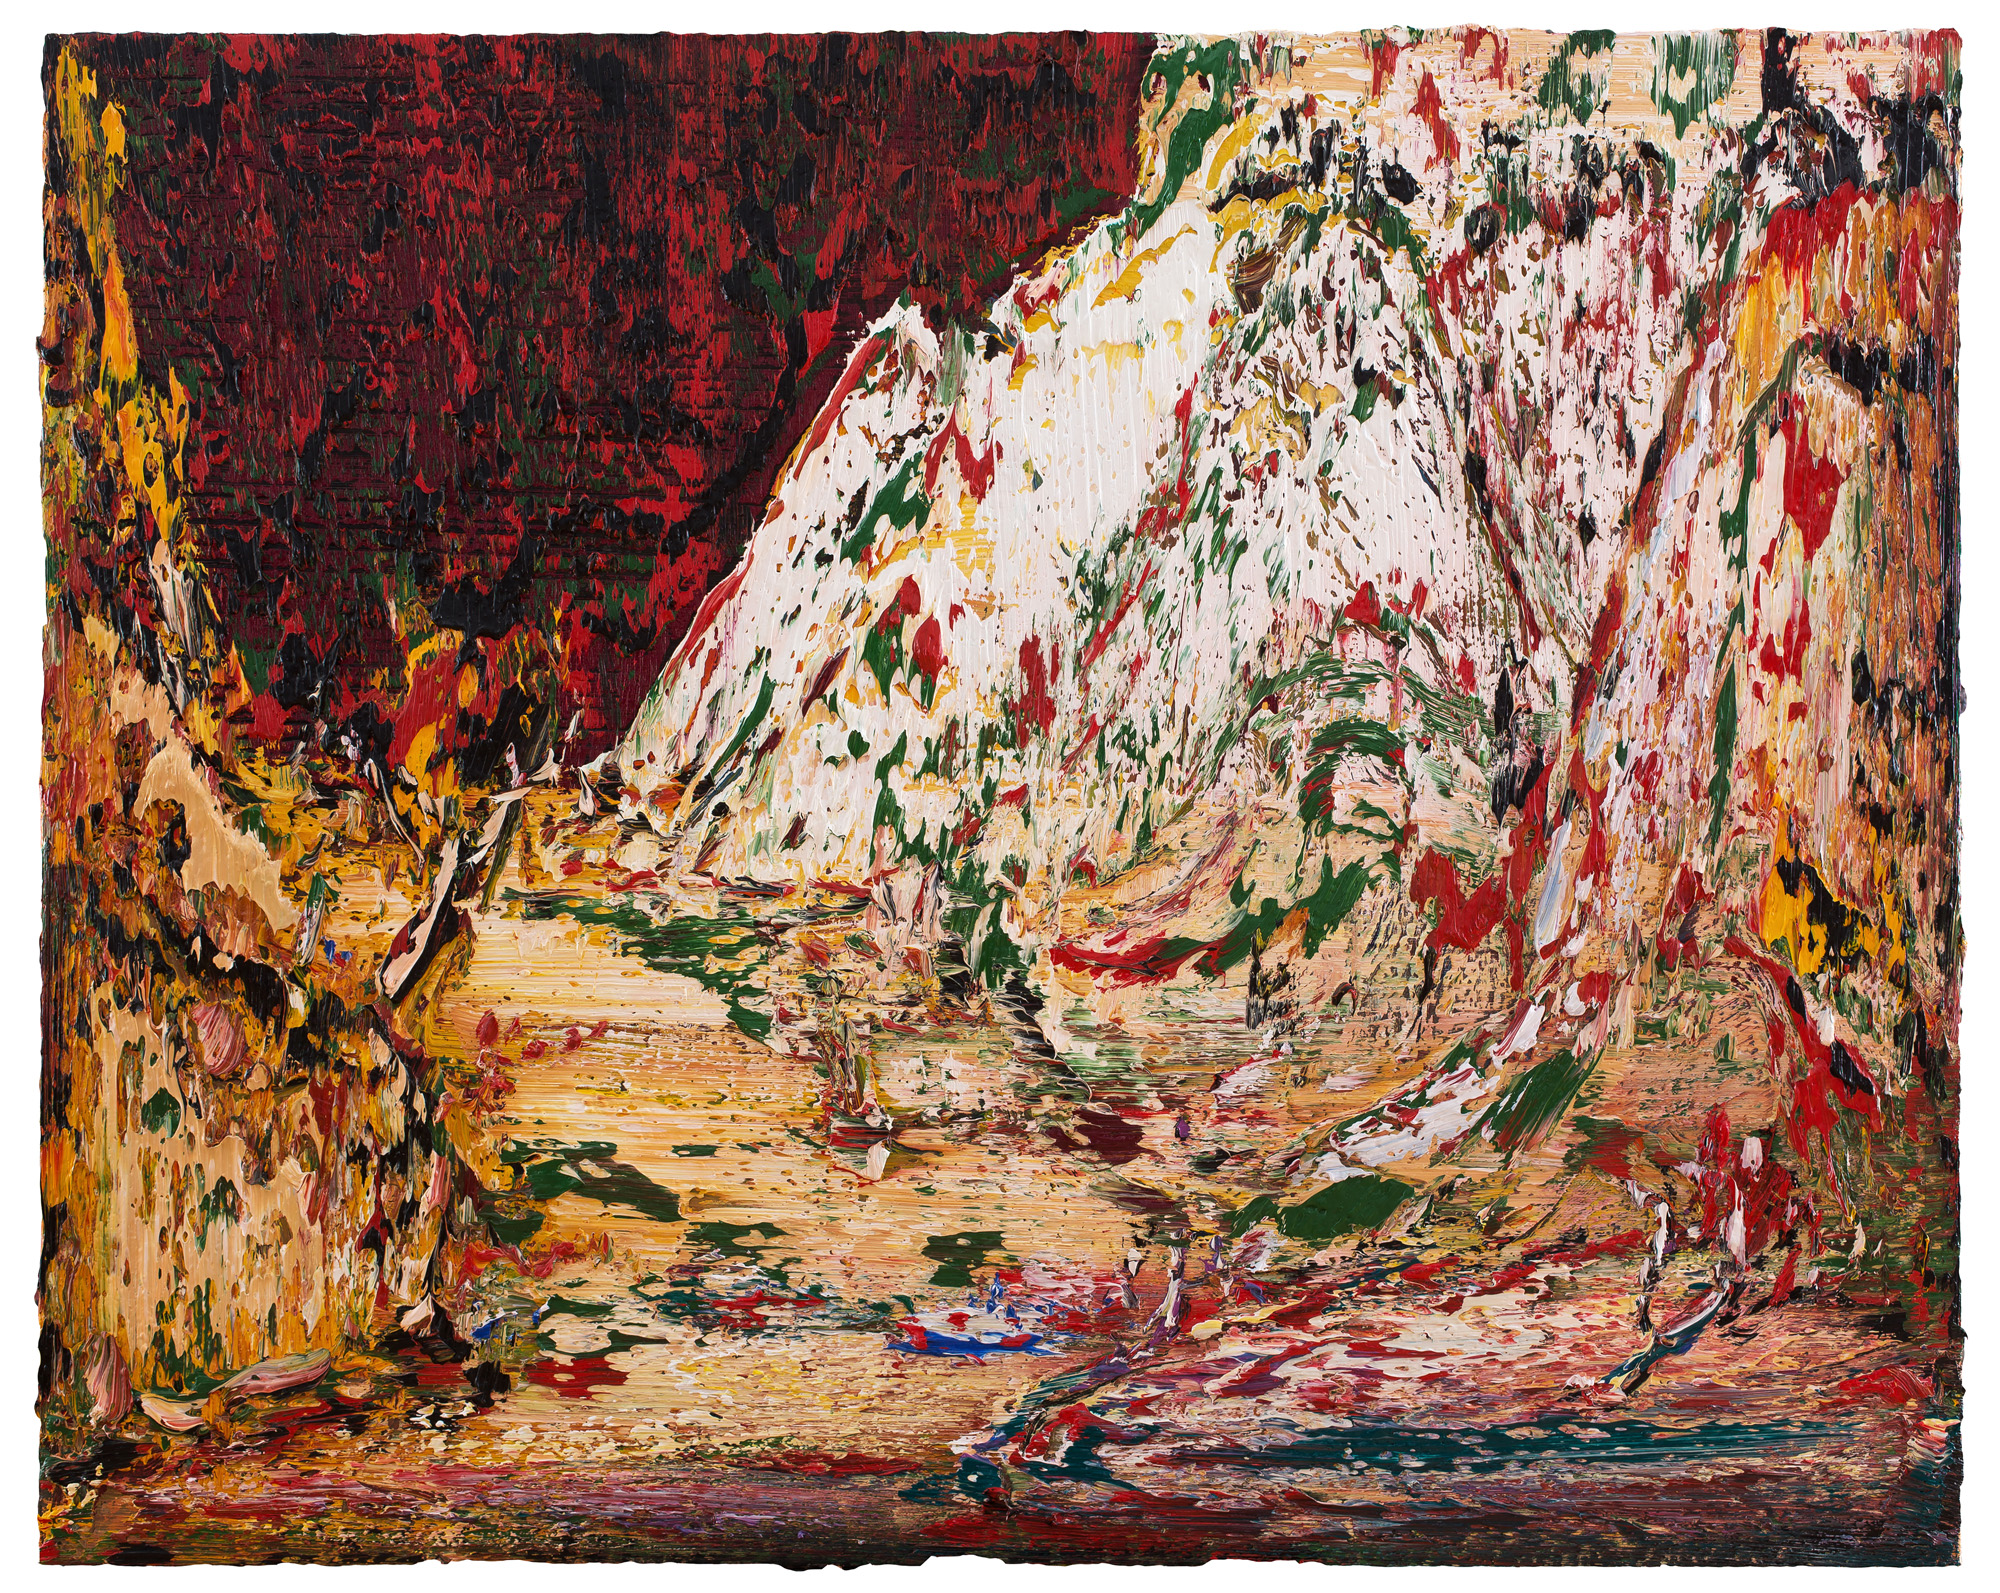 Yin Zhaoyang   White mountain spring , 2018 Oil on canvas 120 x 150 cm